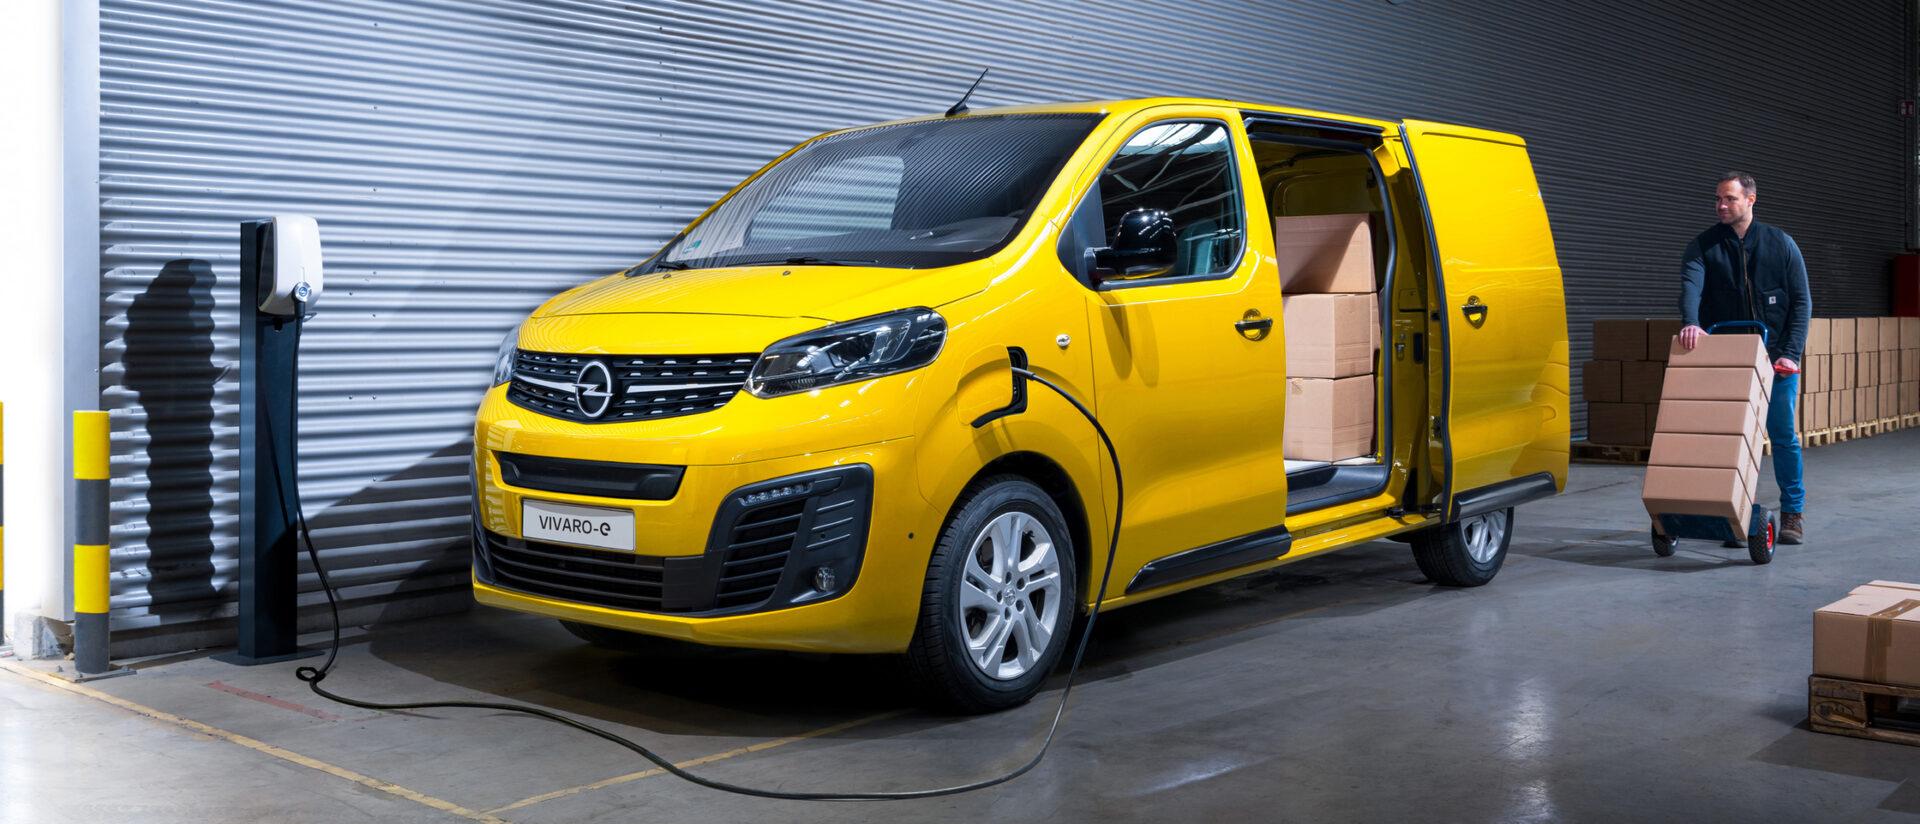 Opel Vivaro-e: Payload capacity.